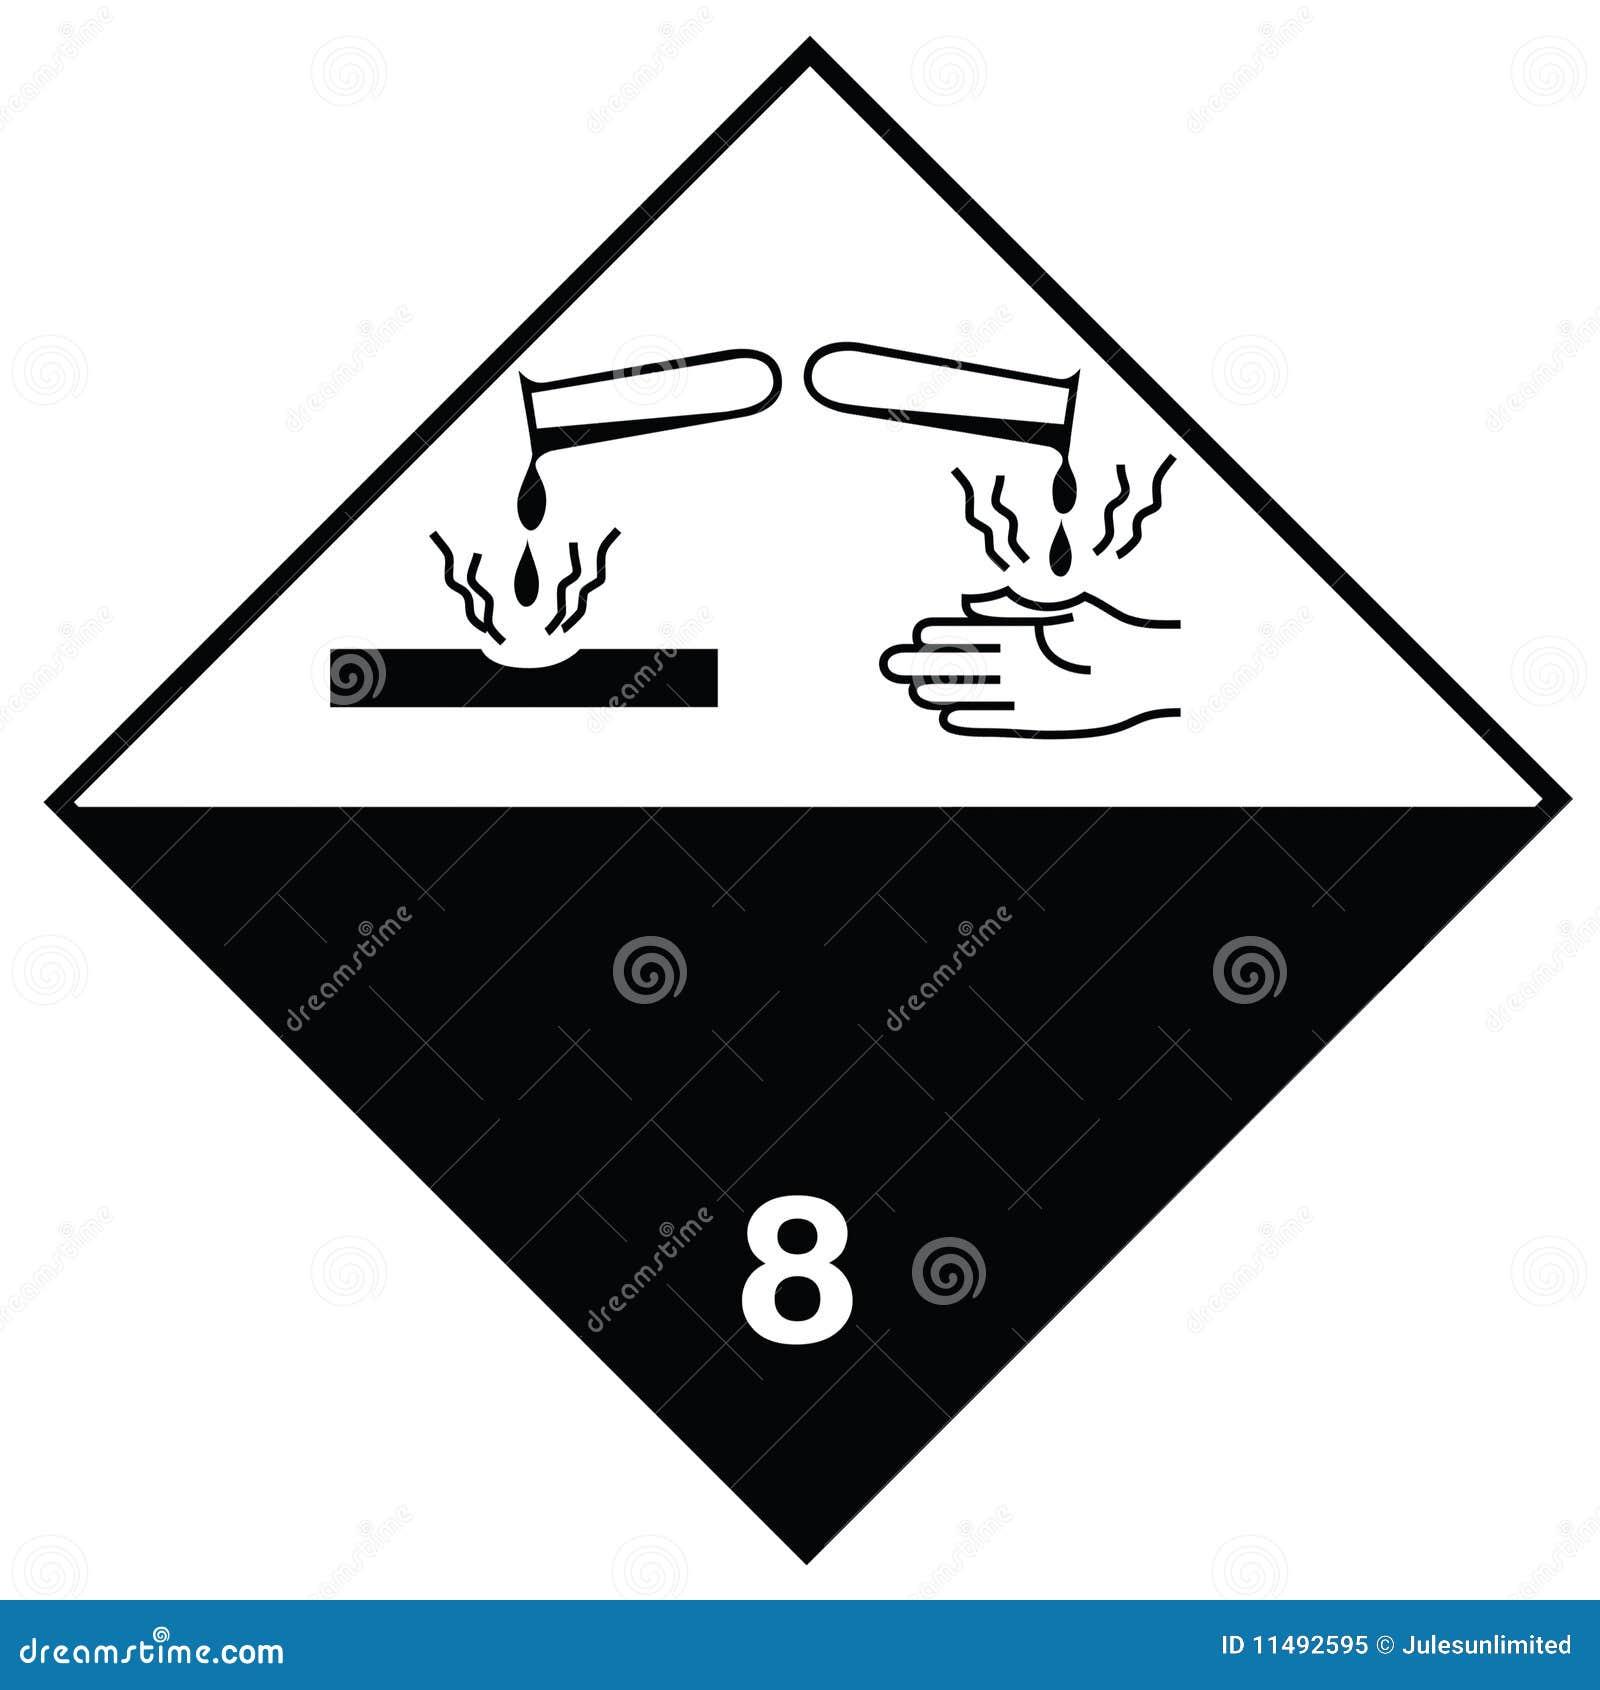 Hazard sign corrosive substances stock image image of background hazard sign corrosive substances biocorpaavc Gallery